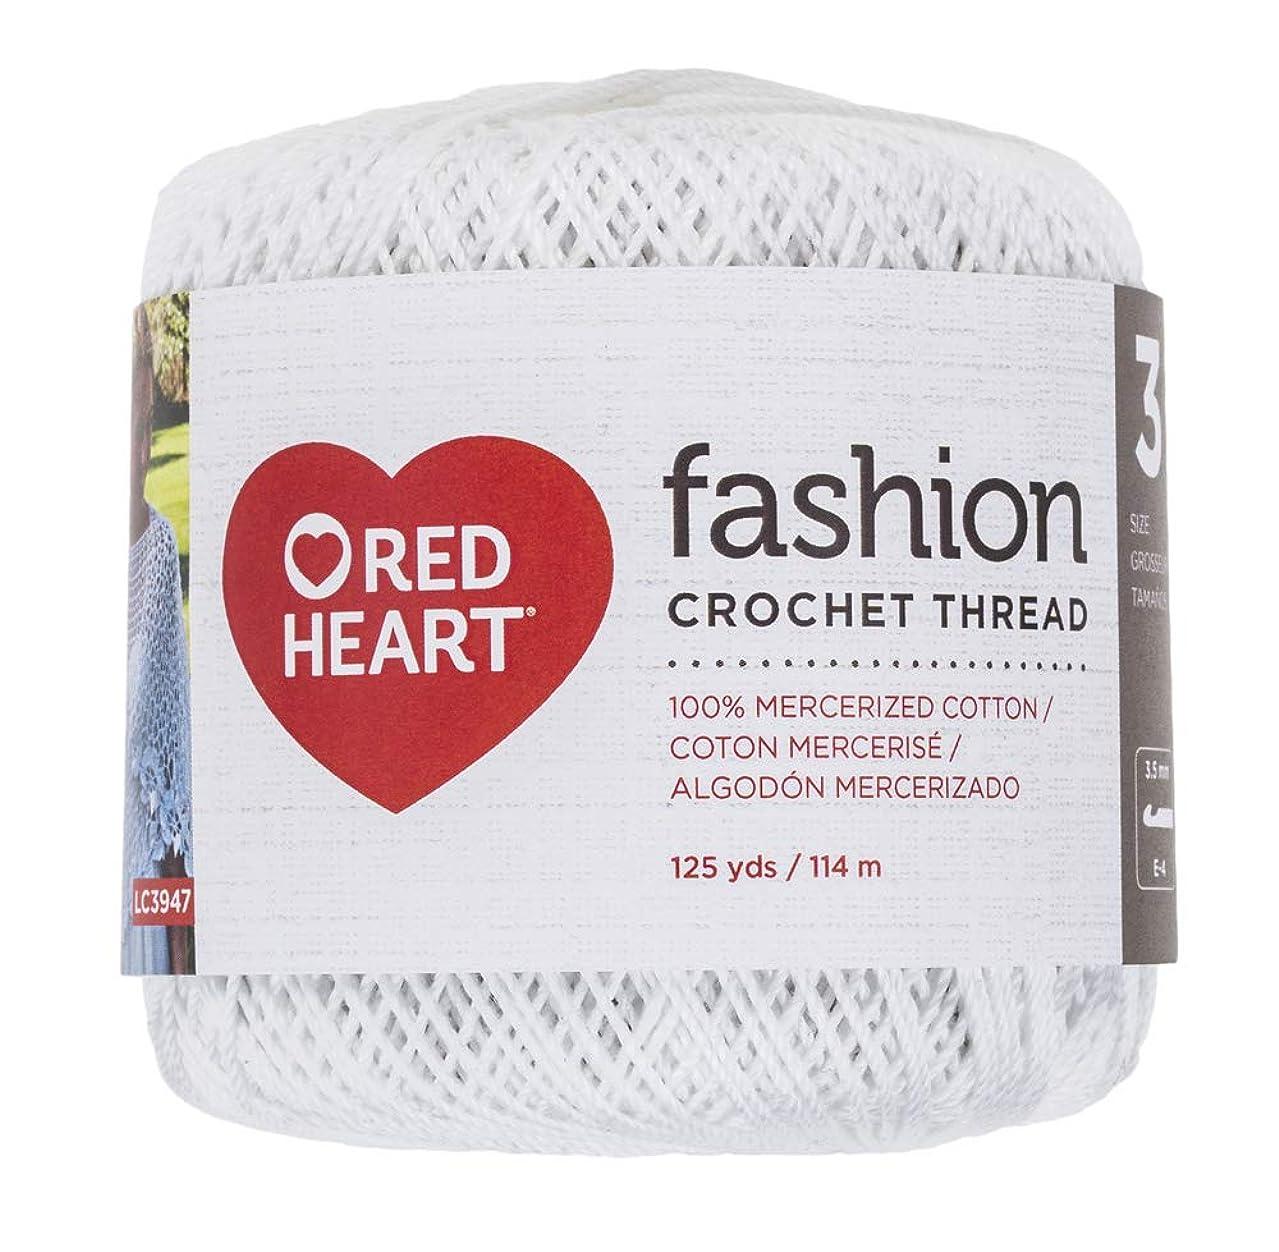 Coats Crochet Red Heart Fashion Crochet, Thread Size 3, White